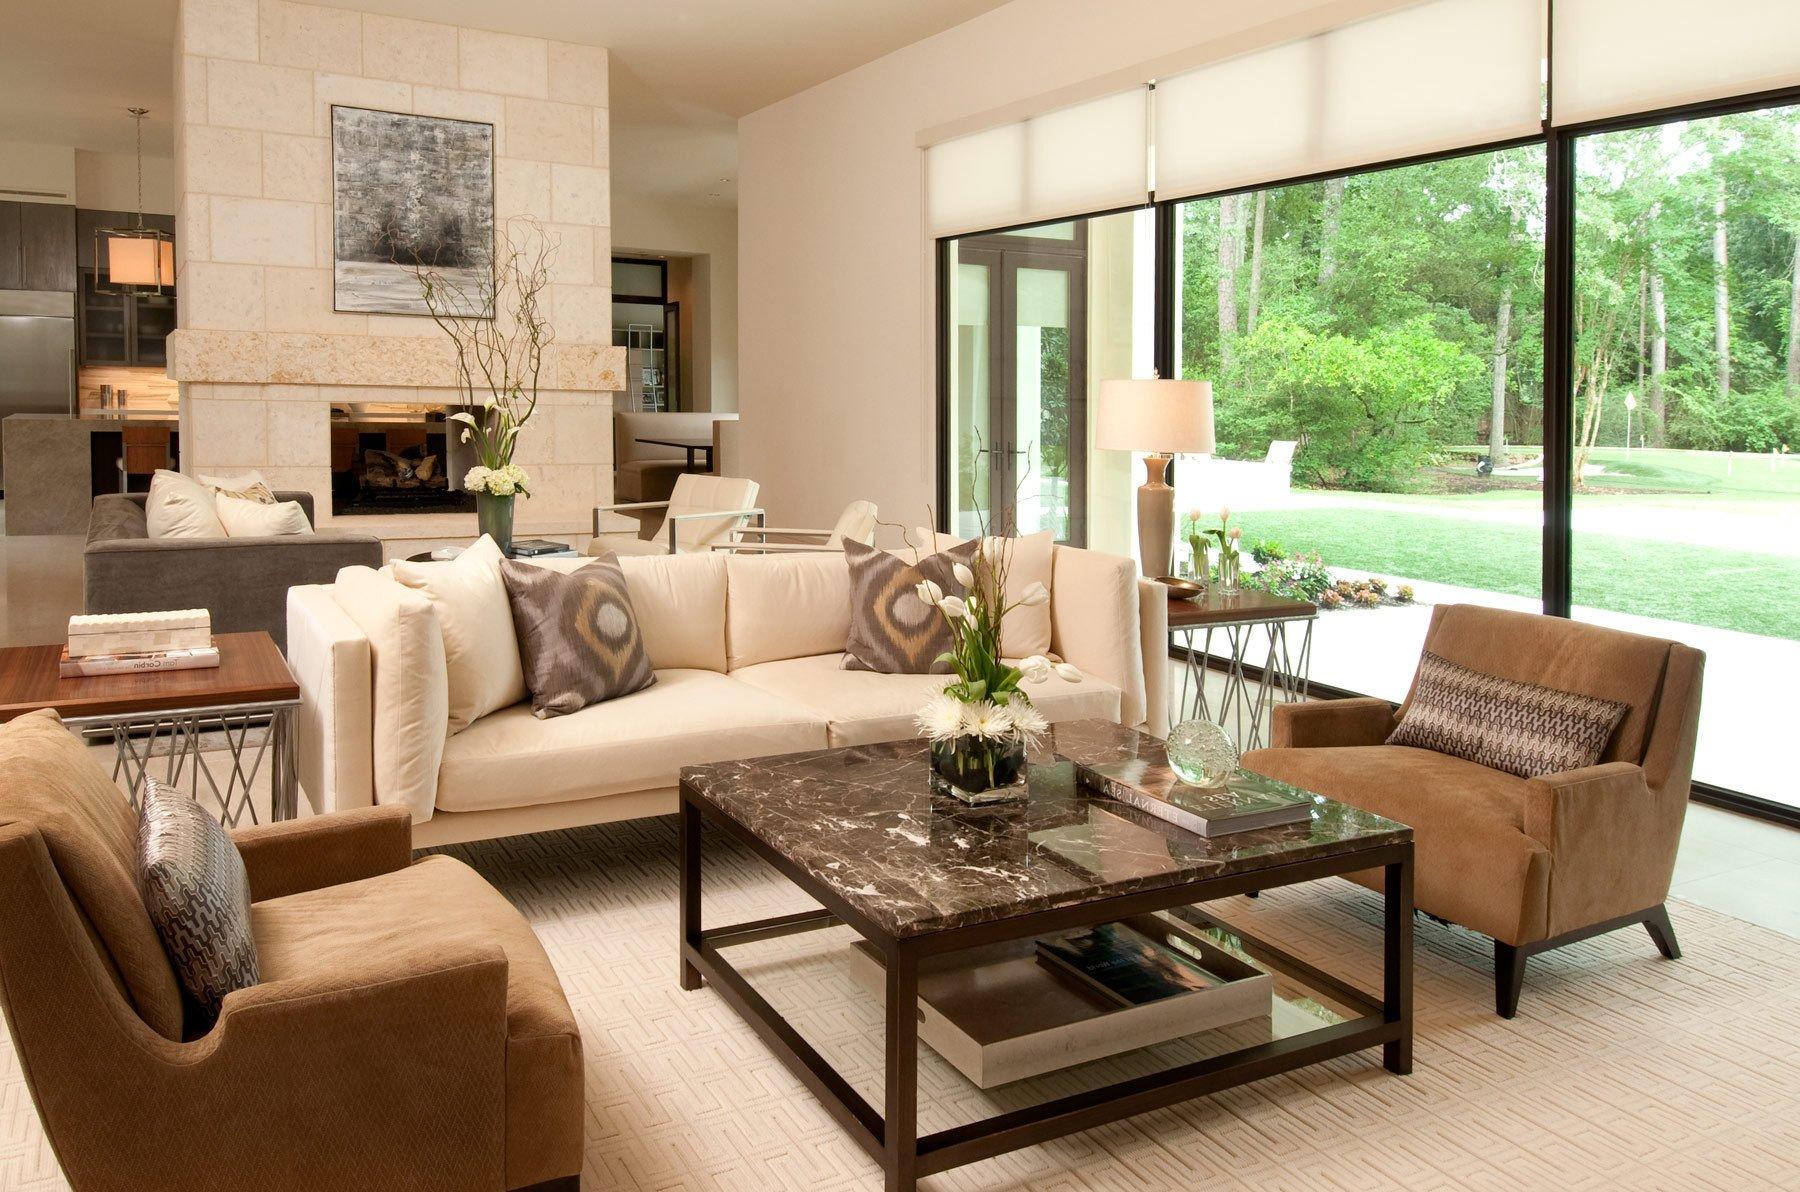 Comfortable Unique Living Room 30 Beautiful Fy Living Room Design Ideas Decoration Love